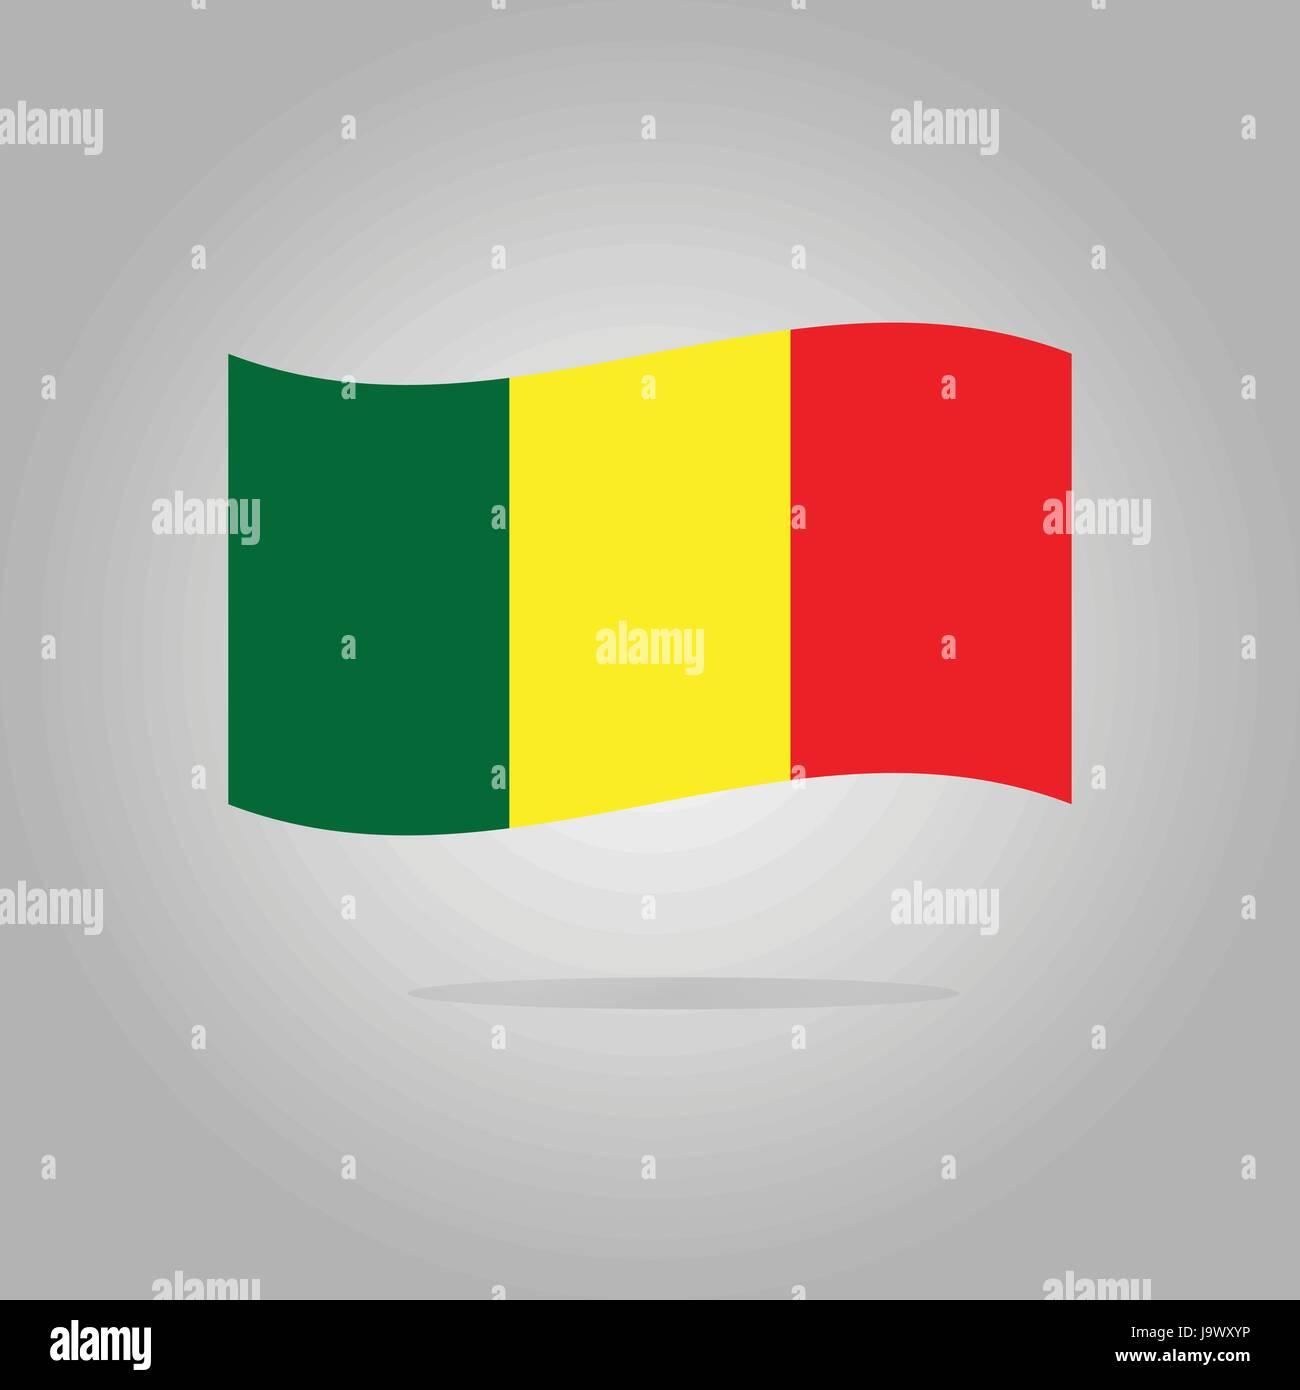 Guinea flag design illustration - Stock Image